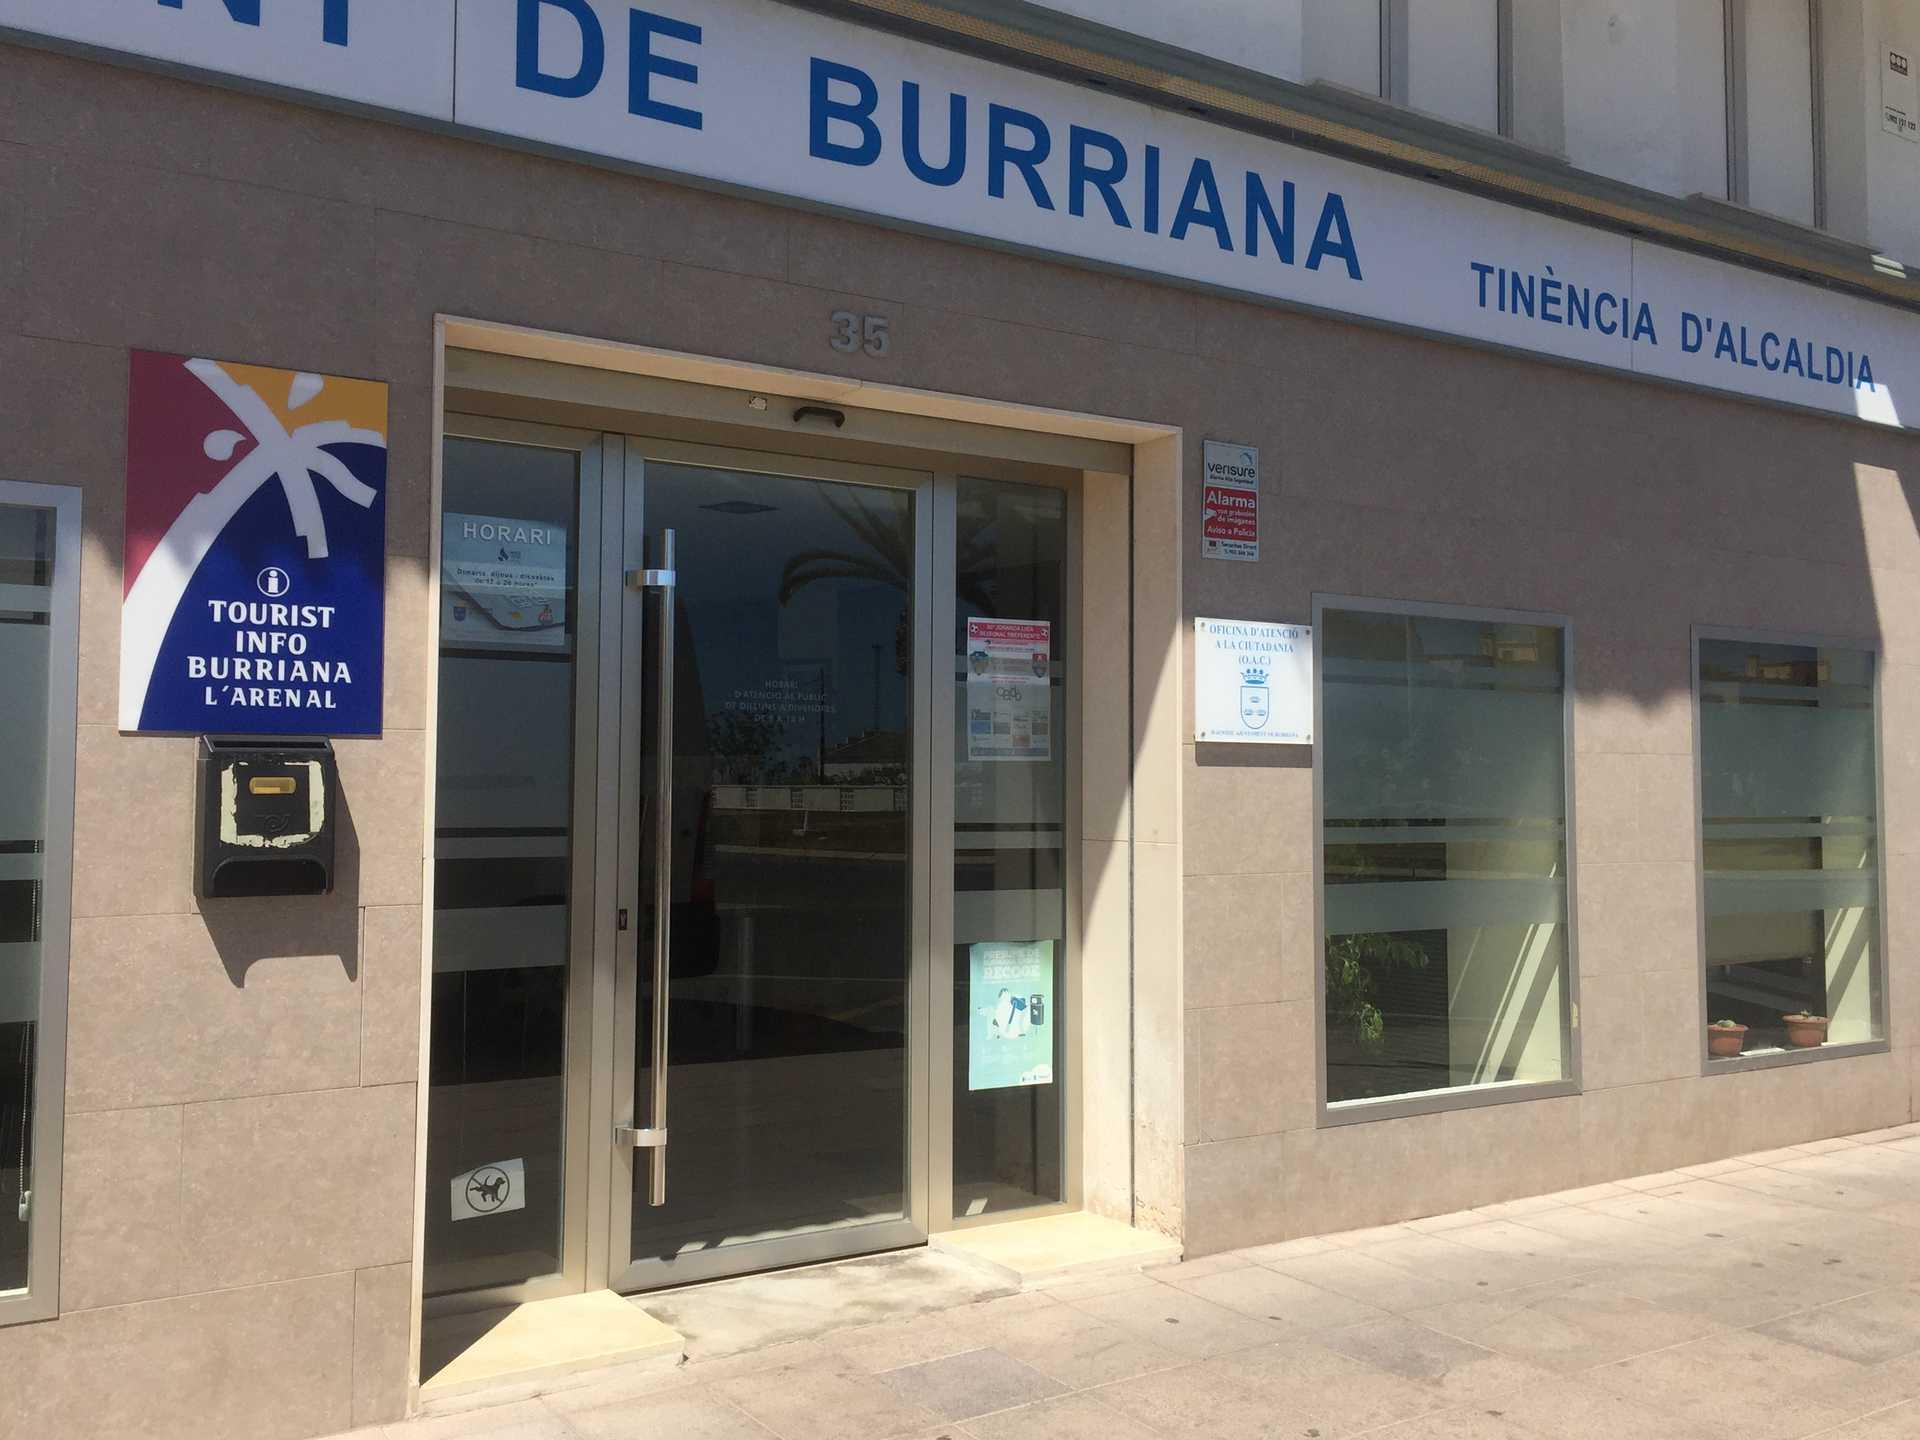 TOURIST INFO BURRIANA - L'ARENAL